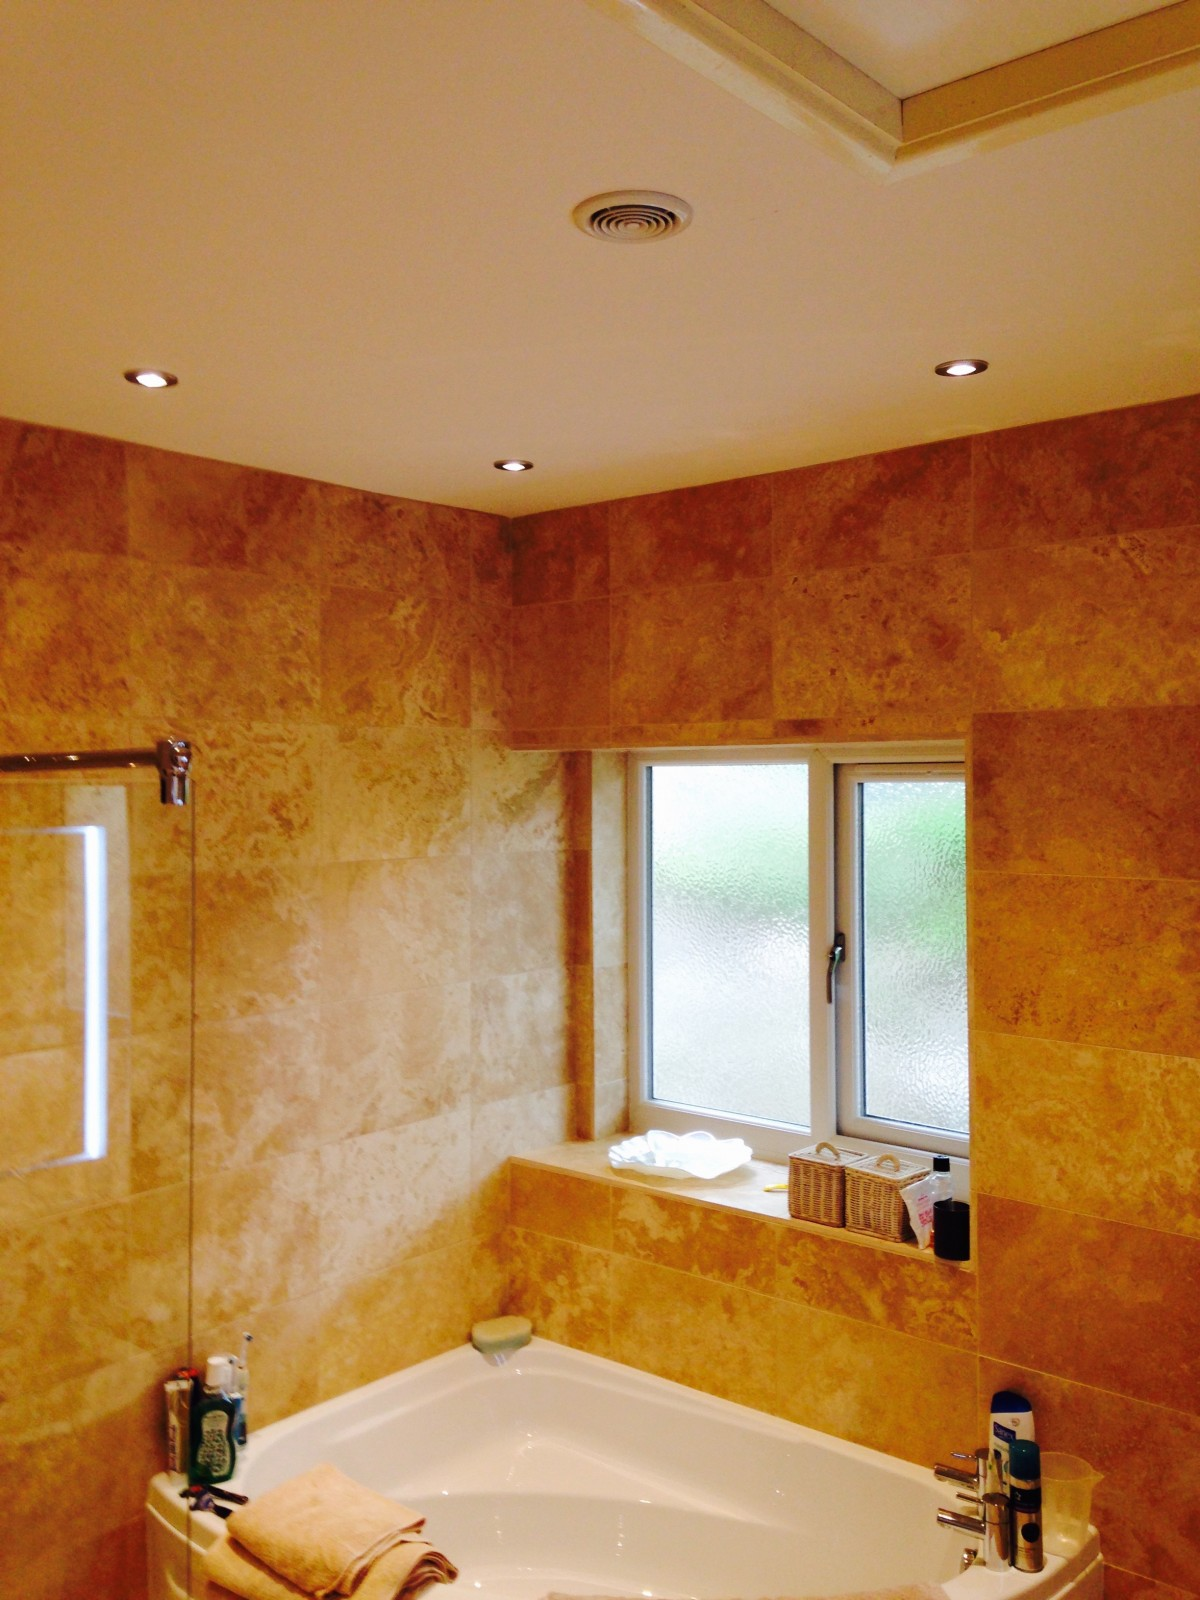 Bathroom Lighting And Ventilation With Perfect Innovation Eyagci Com